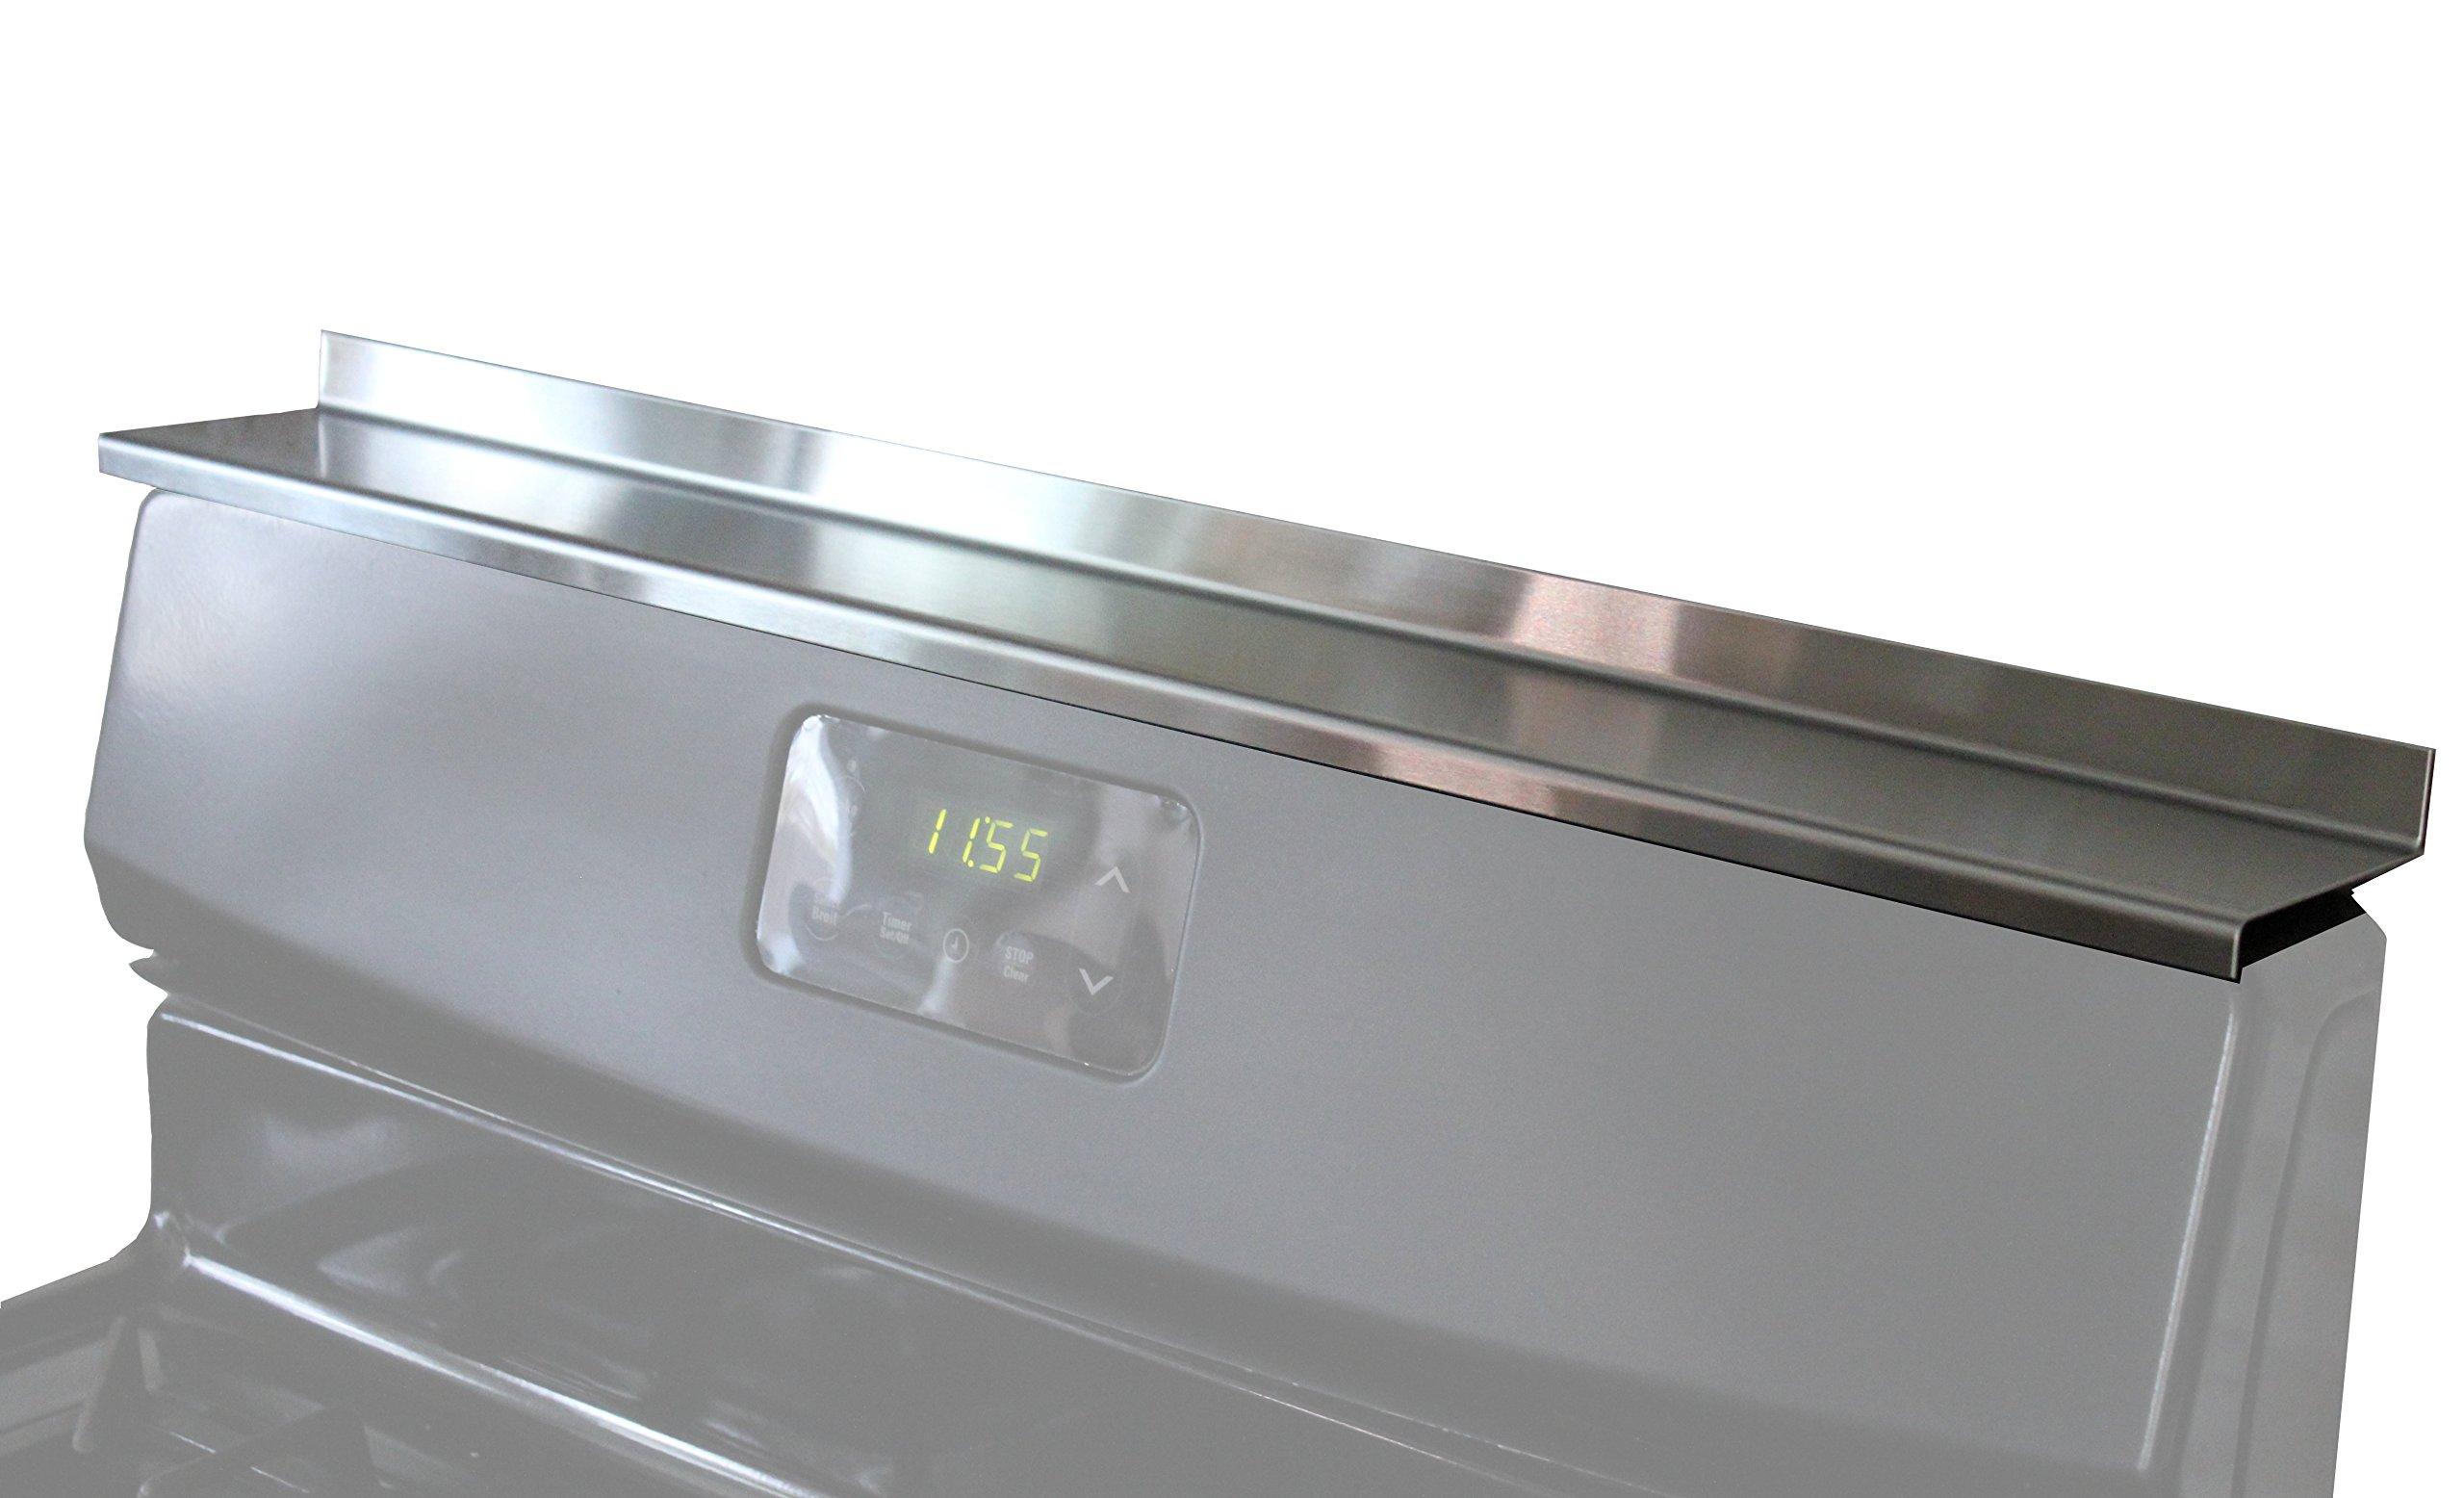 StoveShelf - Stainless Steel - 20'' - Magnetic Shelf for Apartment Kitchen Stove, Spice Rack, Kitchen Storage Solution, Zero Installation by STOVE SHELF